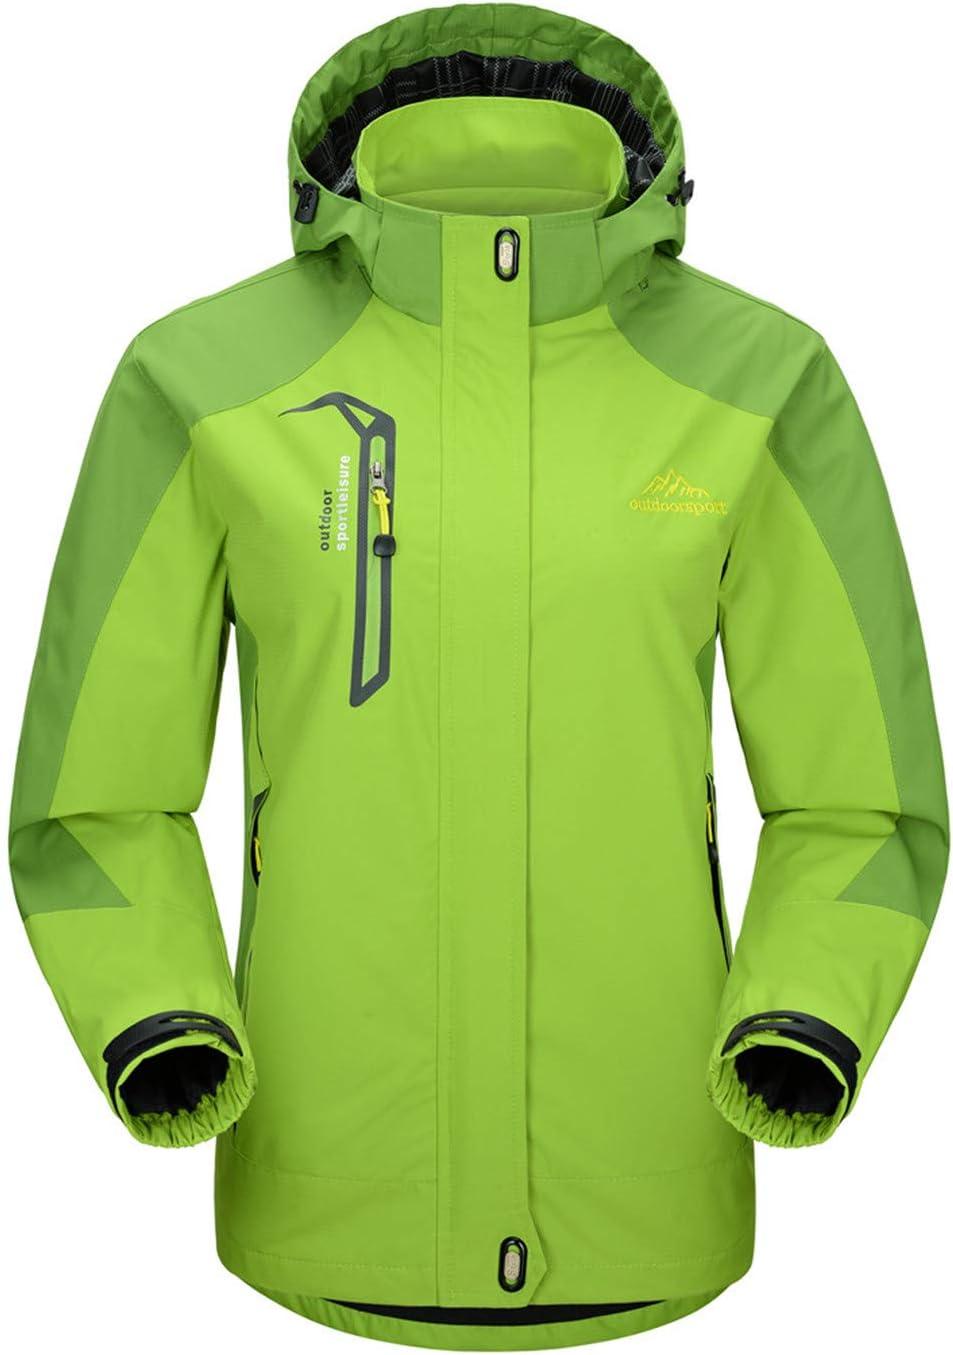 SR-Keistog Unisex Outdoor Waterproof Hiking Jacket Sports Trekking Clothes Camping Fishing Coats